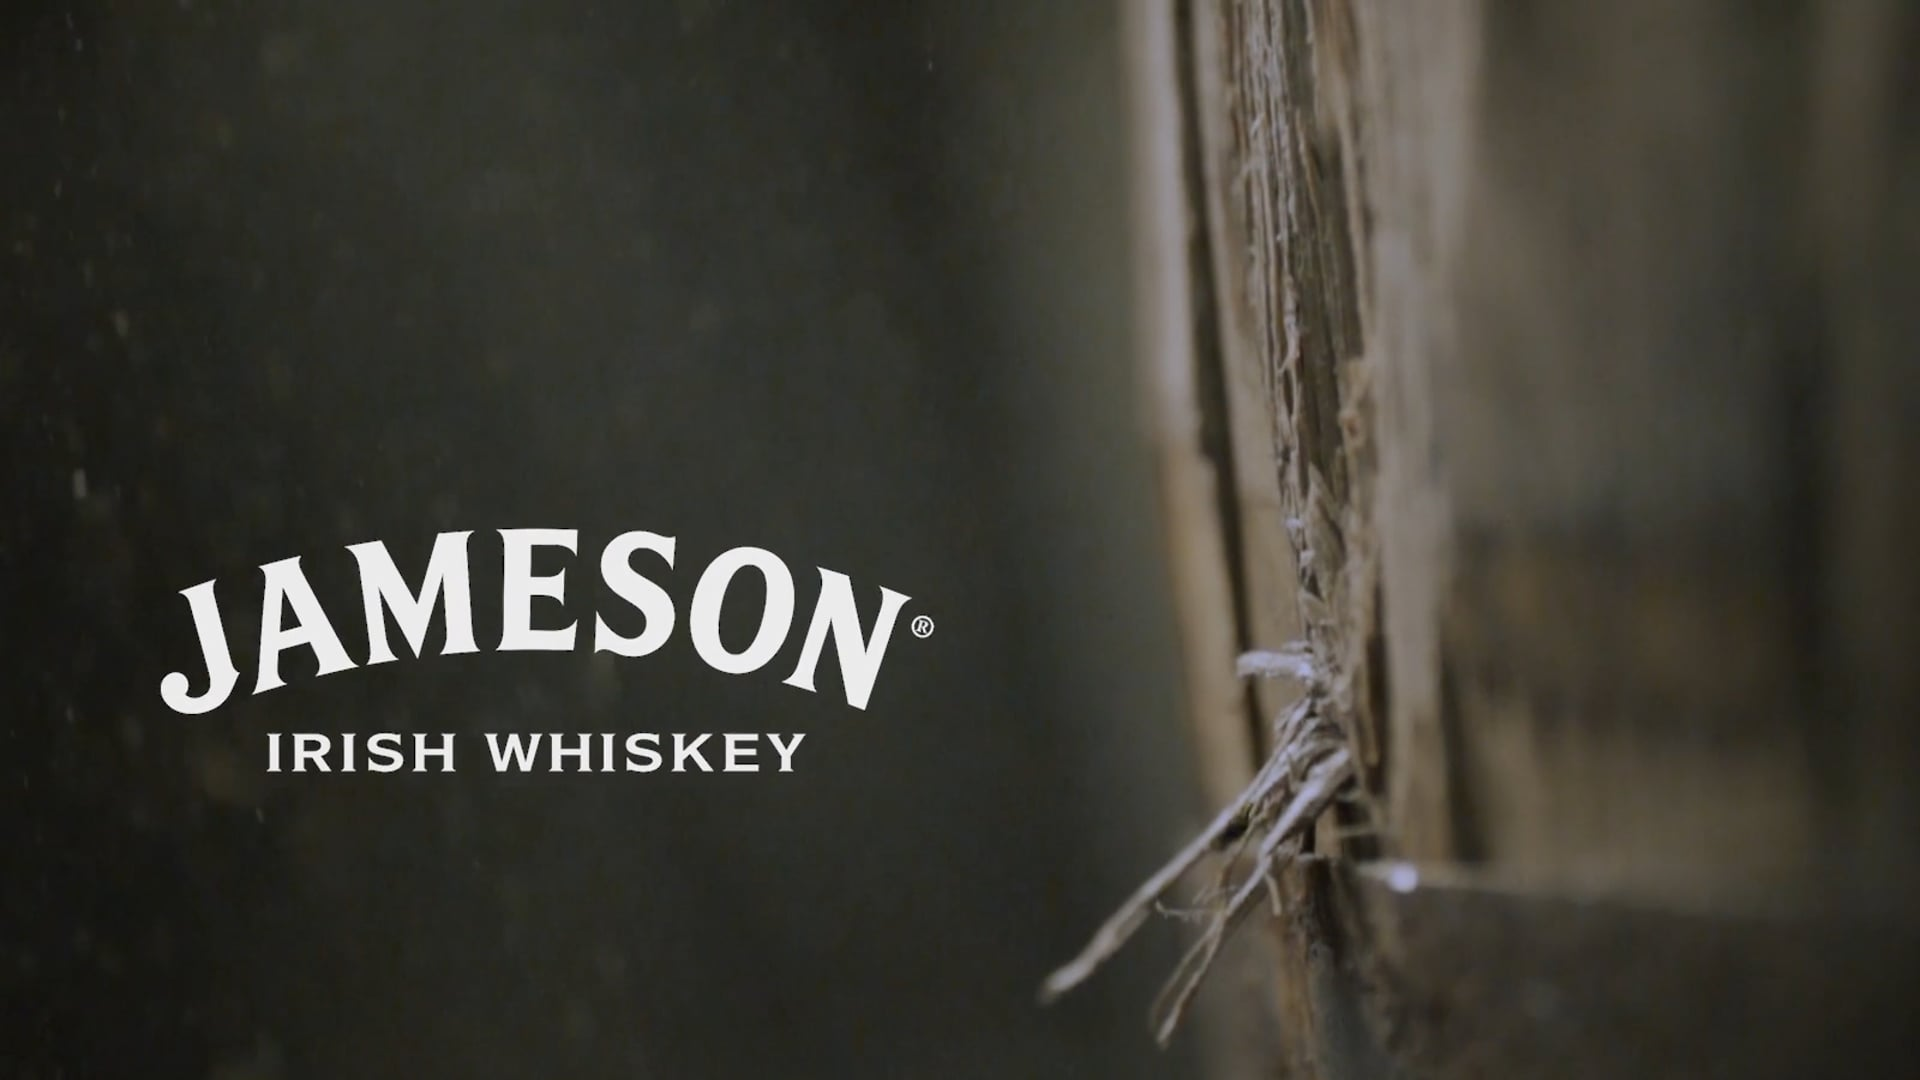 PROMO DOCU - Jameson /Trautenberk